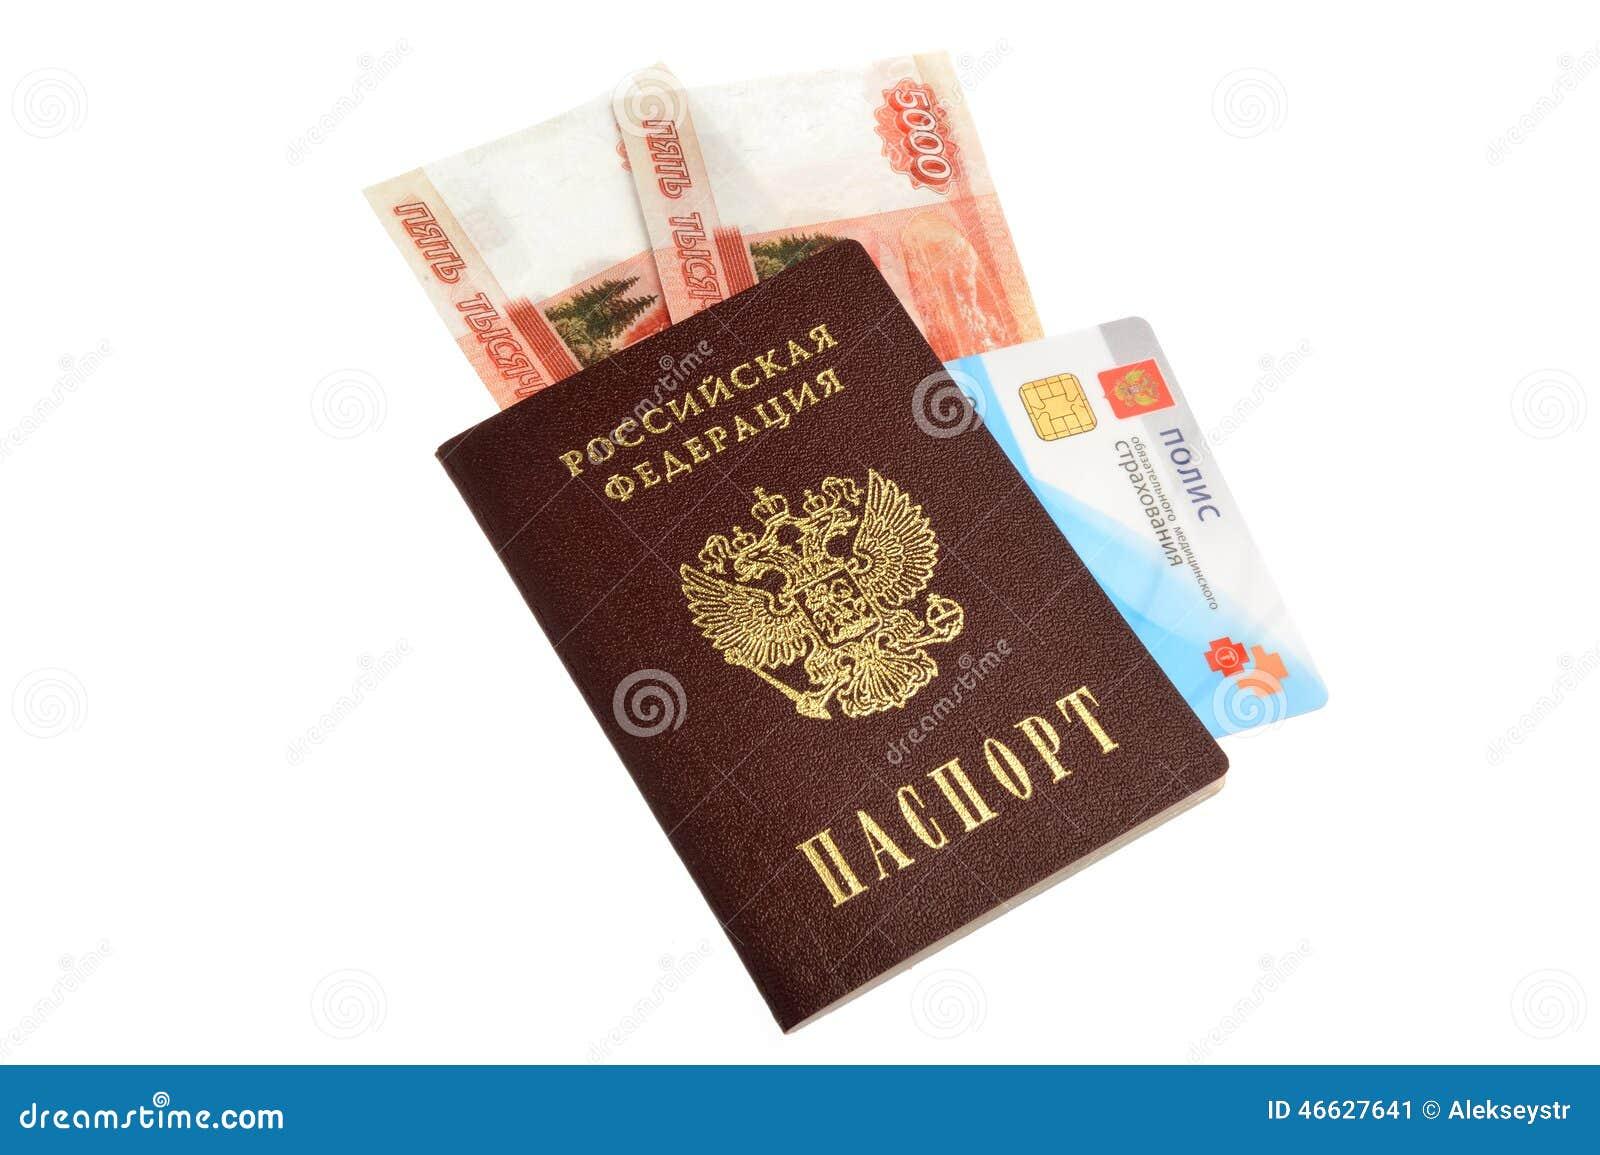 займ на карту без проверки фото паспорта